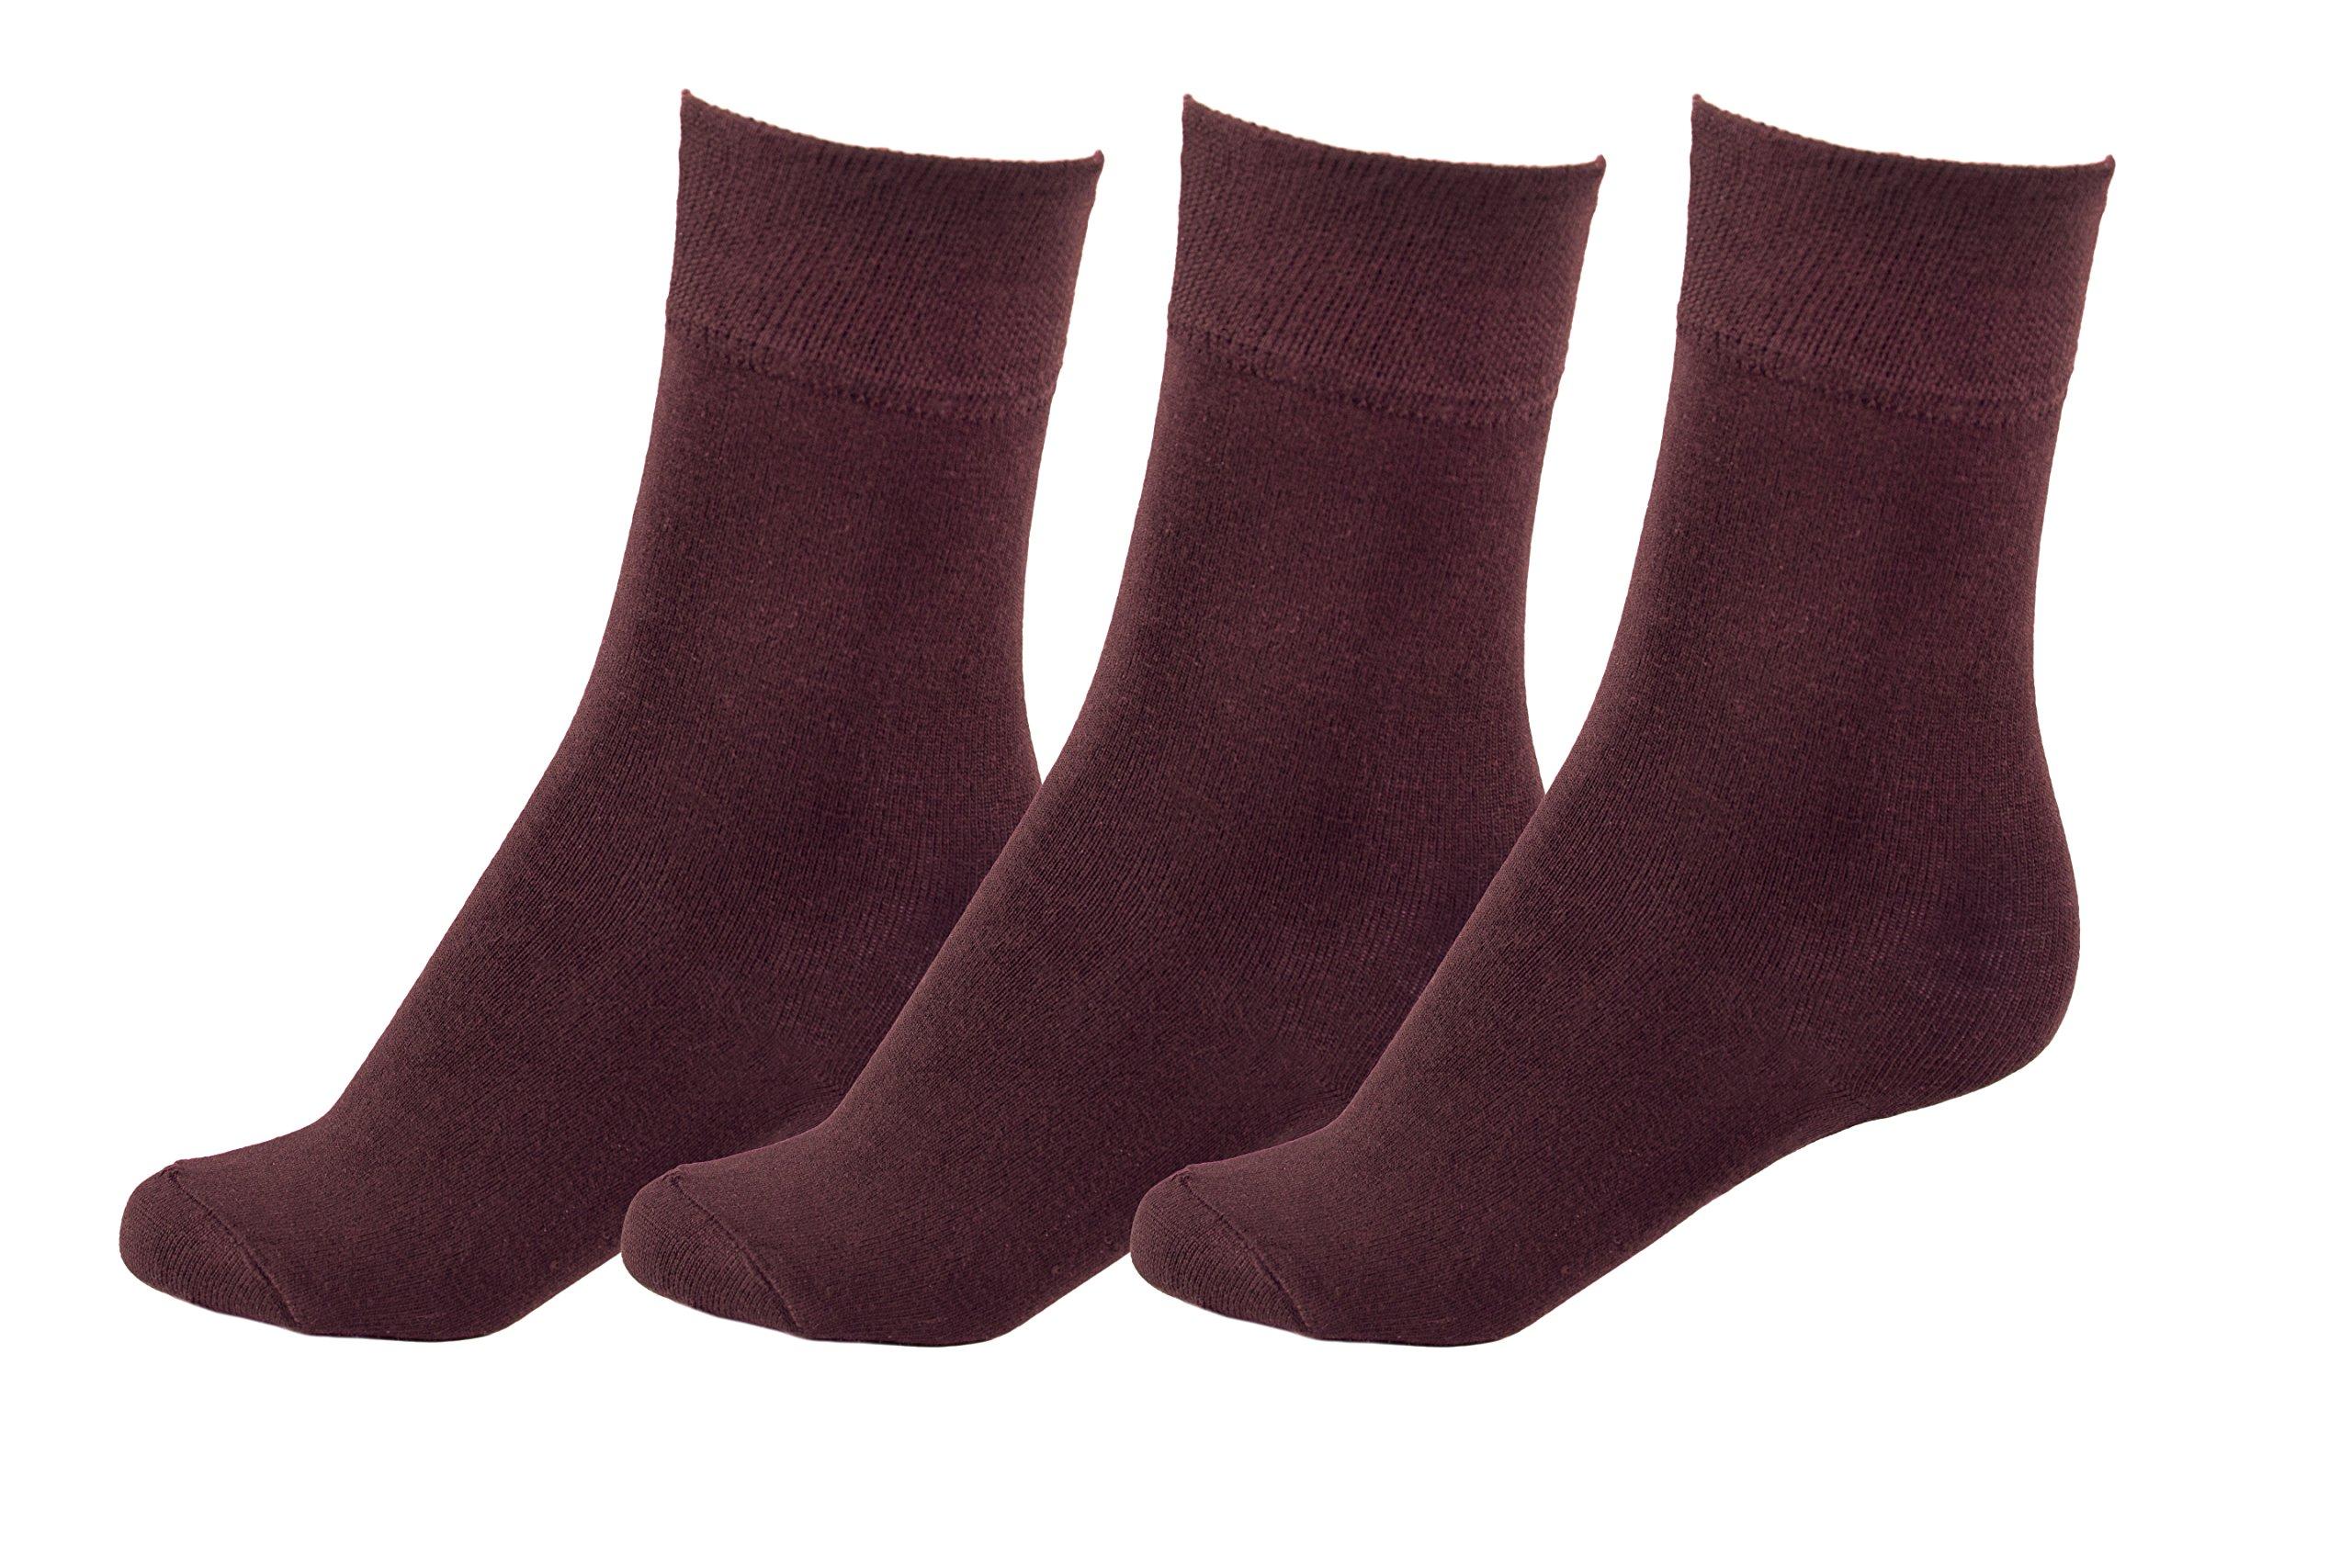 MOTIF SOCKSs All Season WOMEN's Socks Bamboo Business Casual Soft Form-Fitting Comfort Shoe Size : 6-9 (Brown)